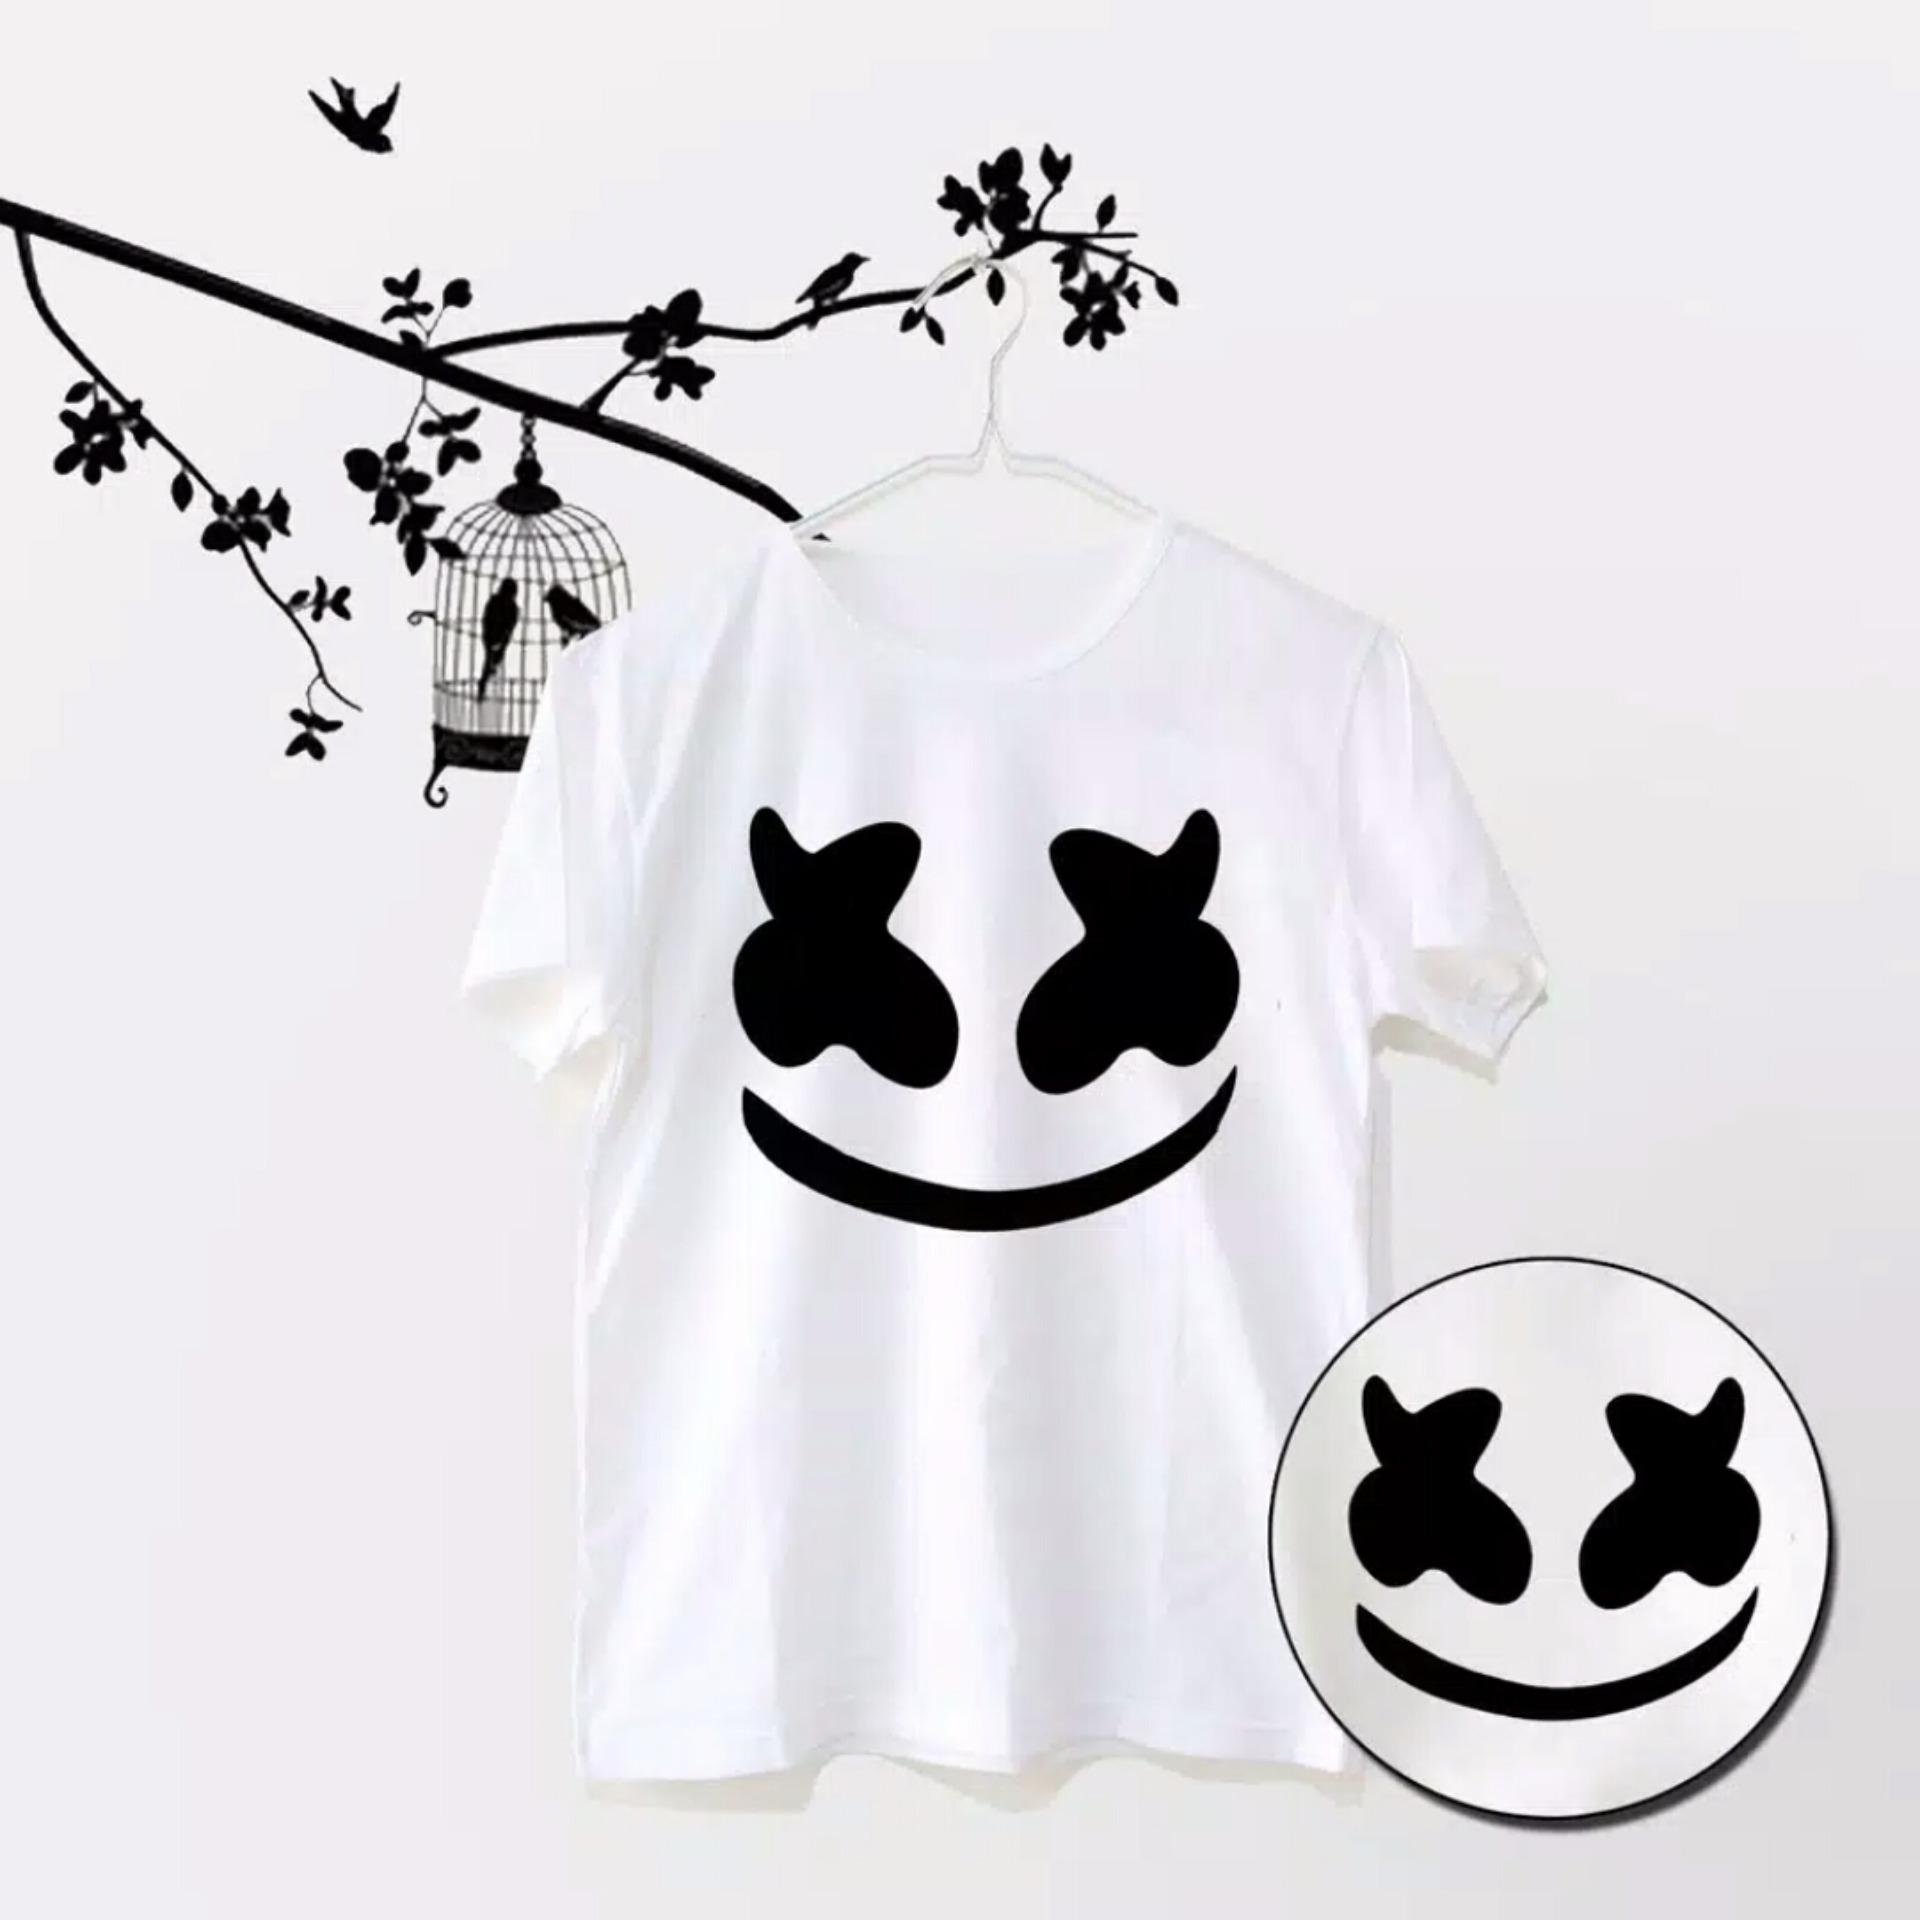 Harga T Shirt Tumblr Kaos Dj Marshmello Tshirt Marshmello Cewek Cowok Marshmallow Origin